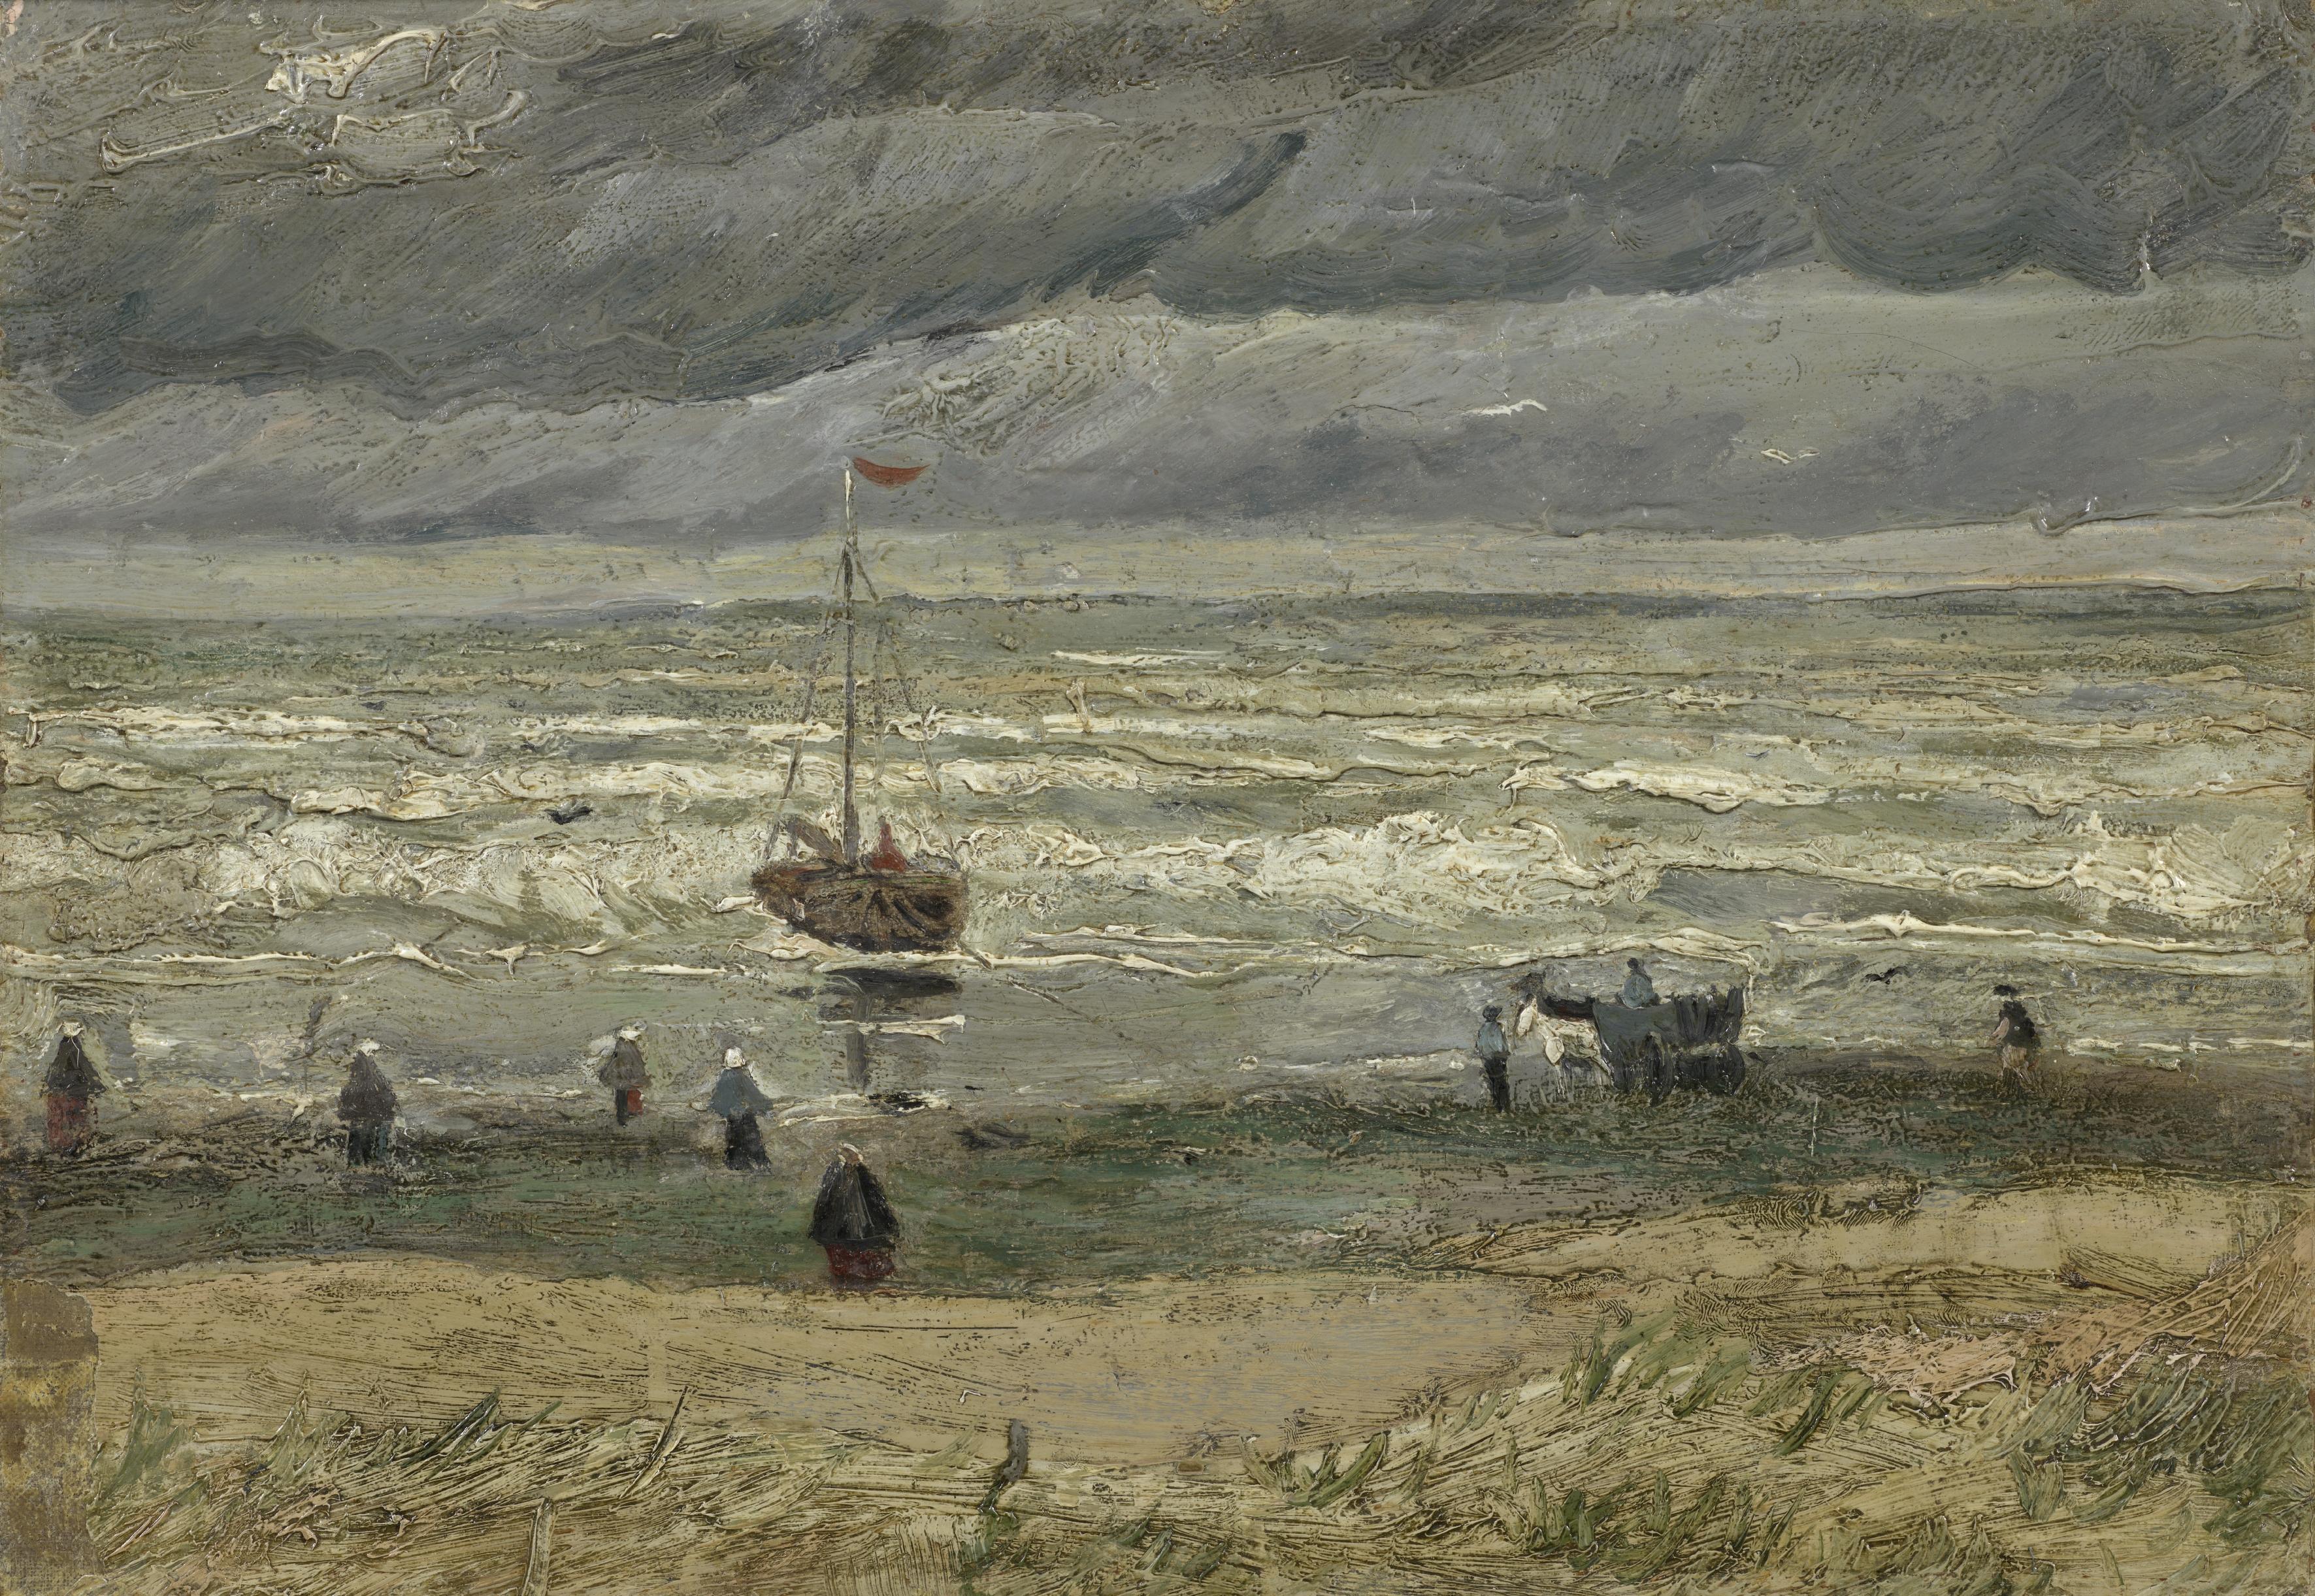 Van Gogh Ван Гог Scheveningen Схевенинген море картина seascape пейзажи природы Альберт Сафиуллин